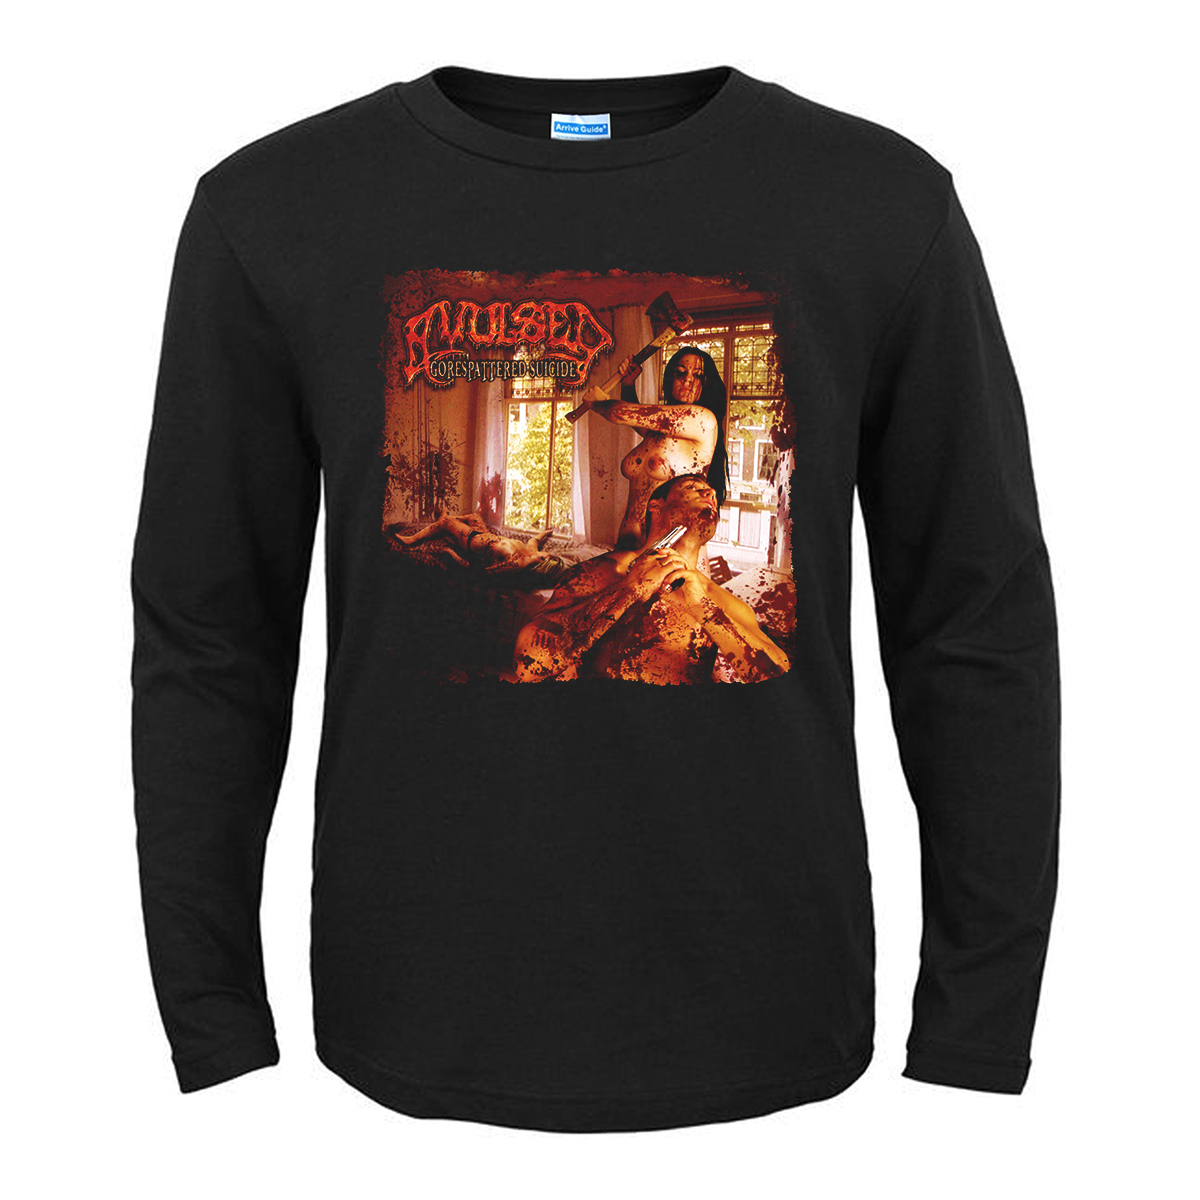 Merchandise T-Shirt Avulsed Gorespattered Suicide